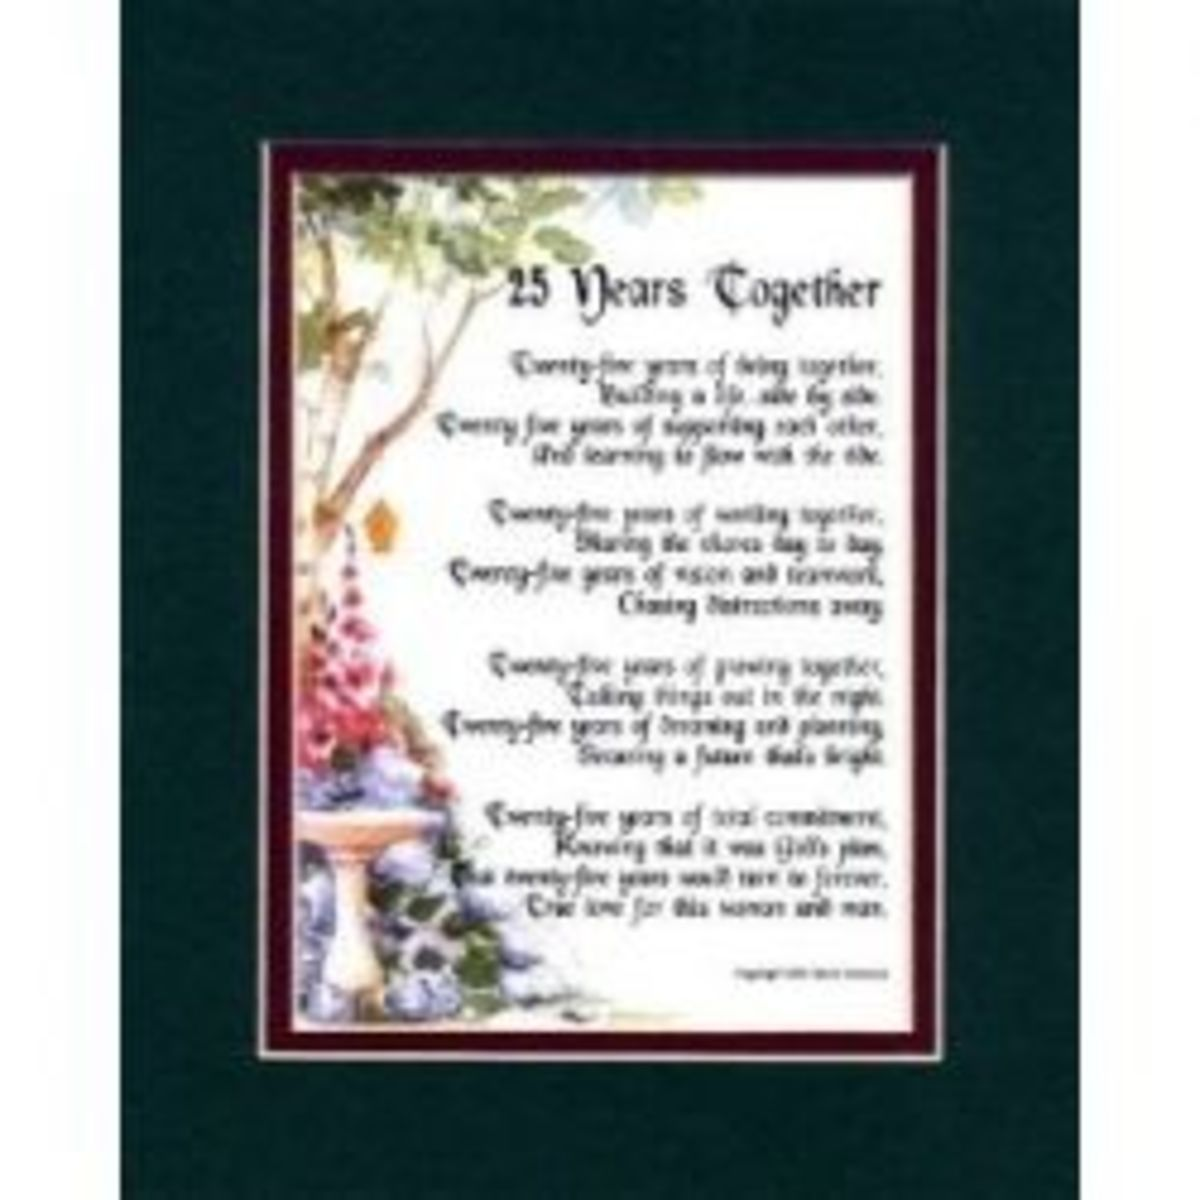 25th Wedding Anniversary Poem